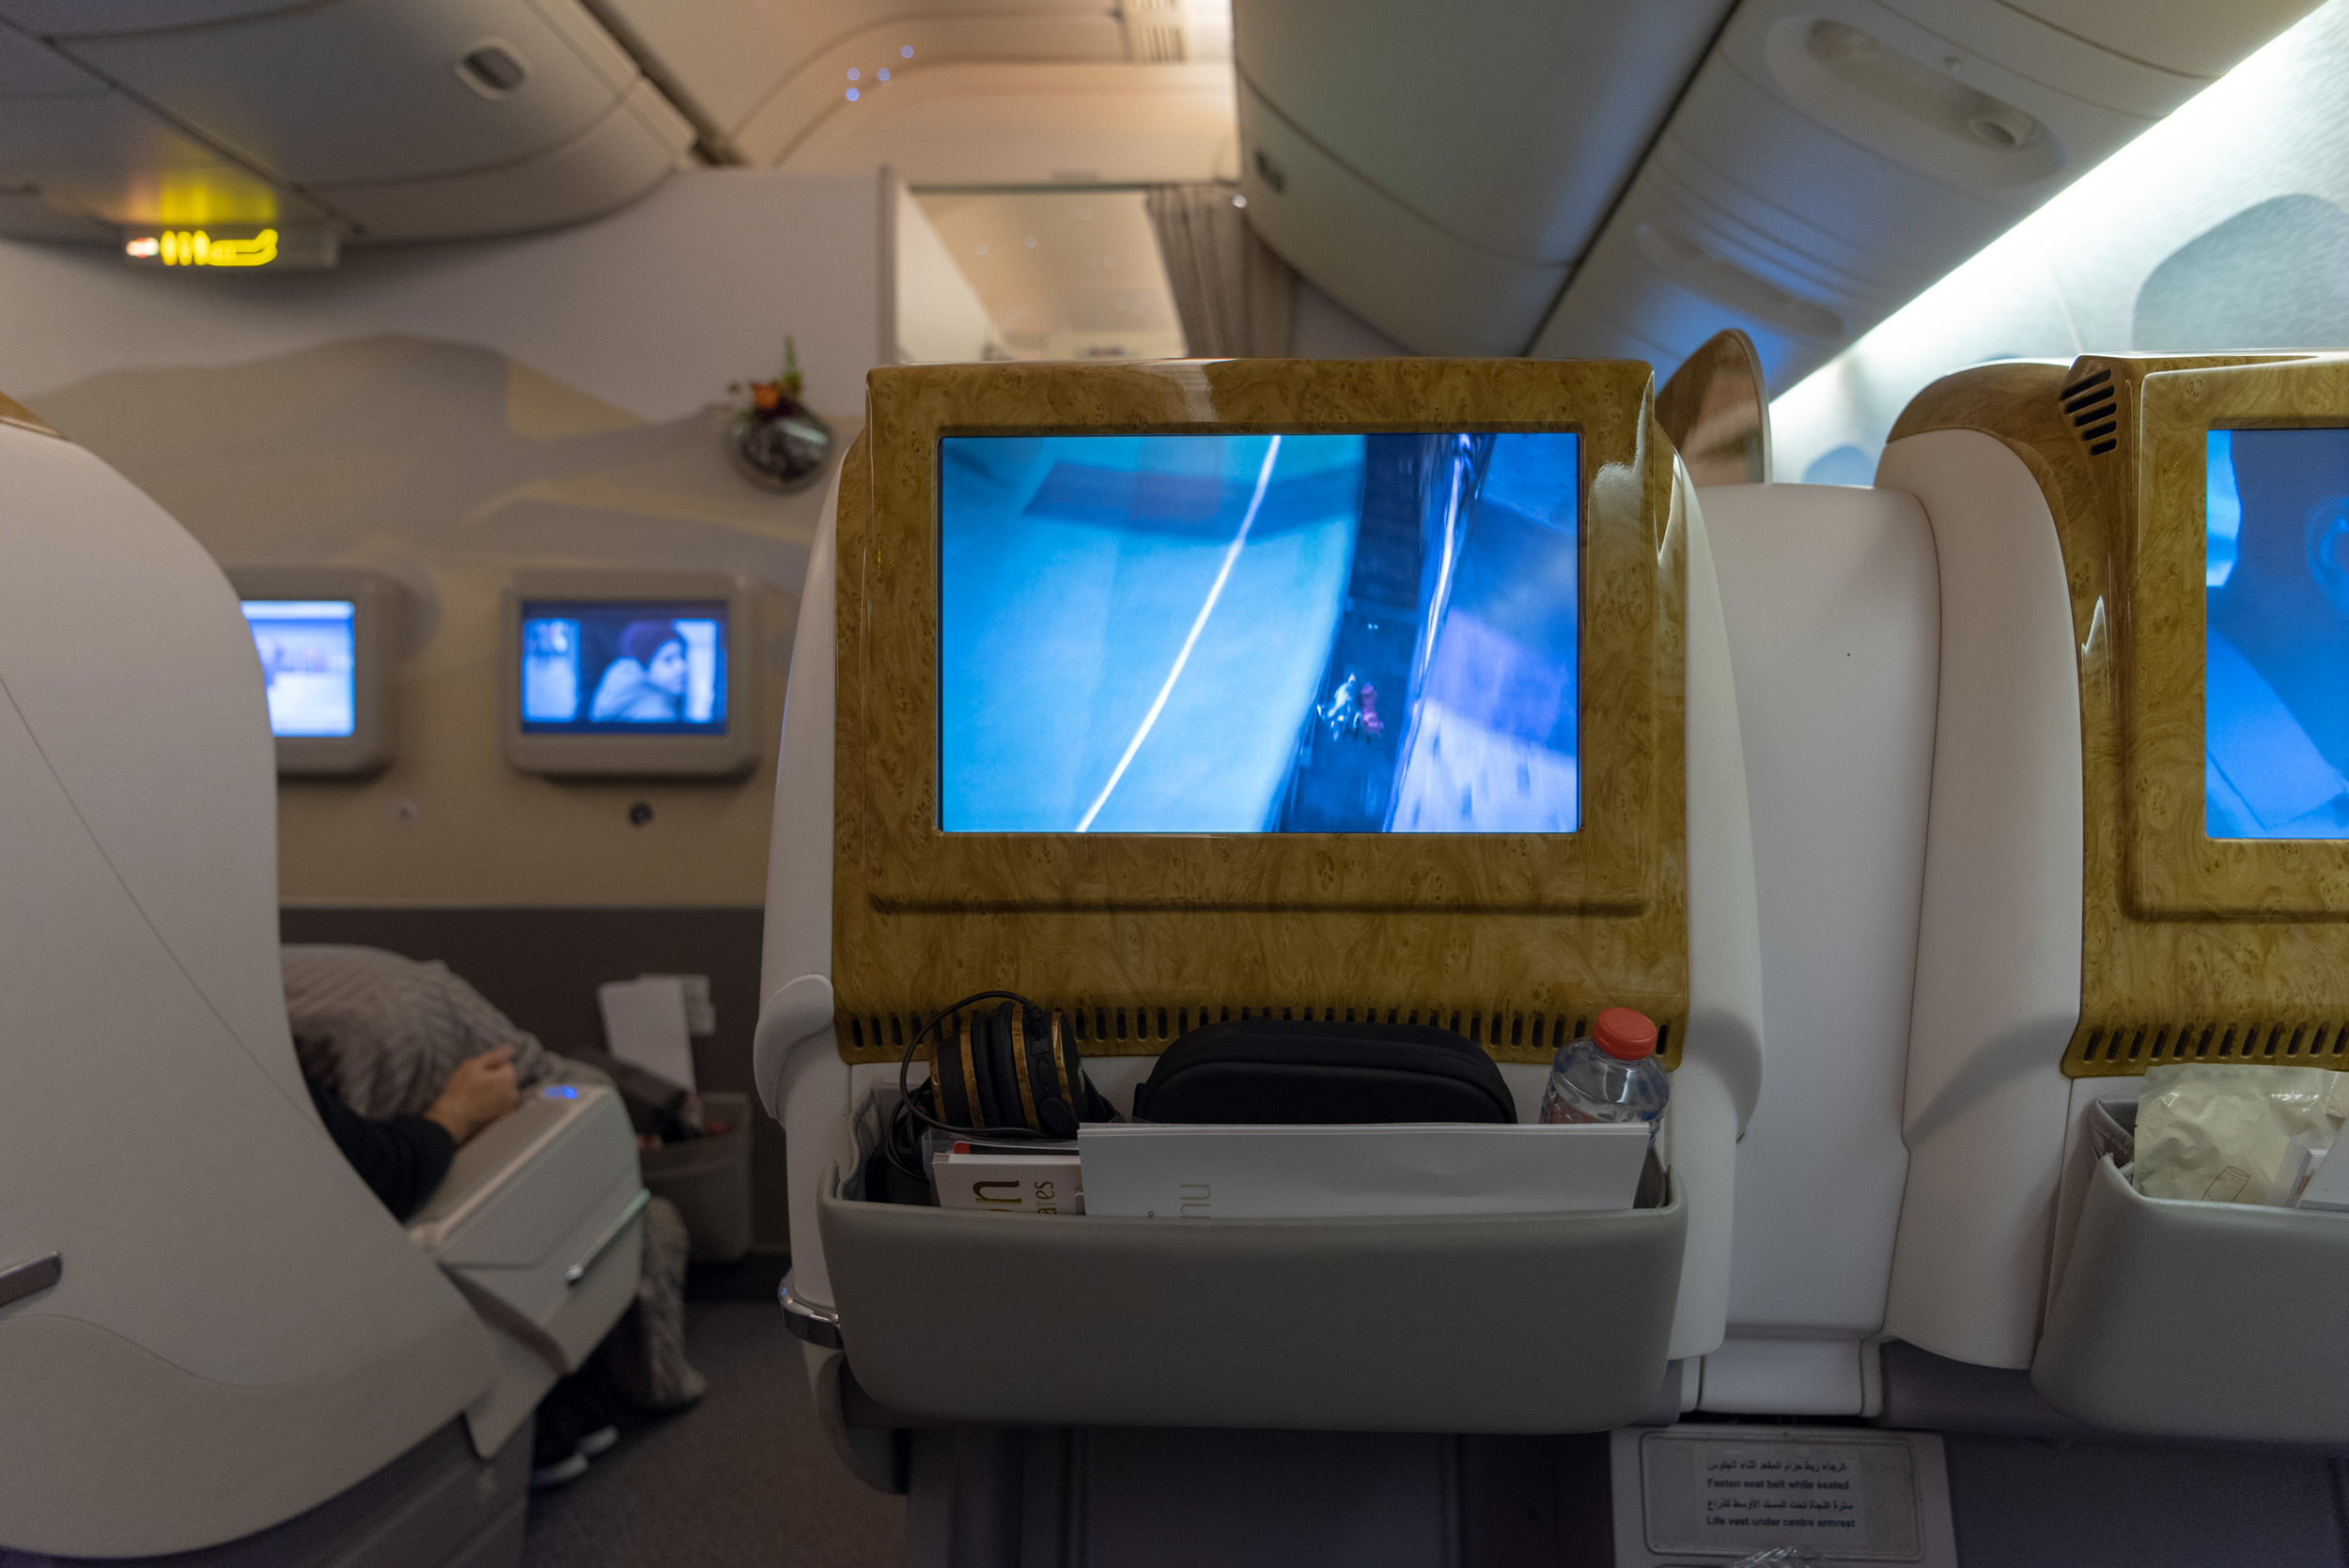 In-flight Entertainment Screen  Emirates EK352 Business Class 777-300ER - DXB to SIN